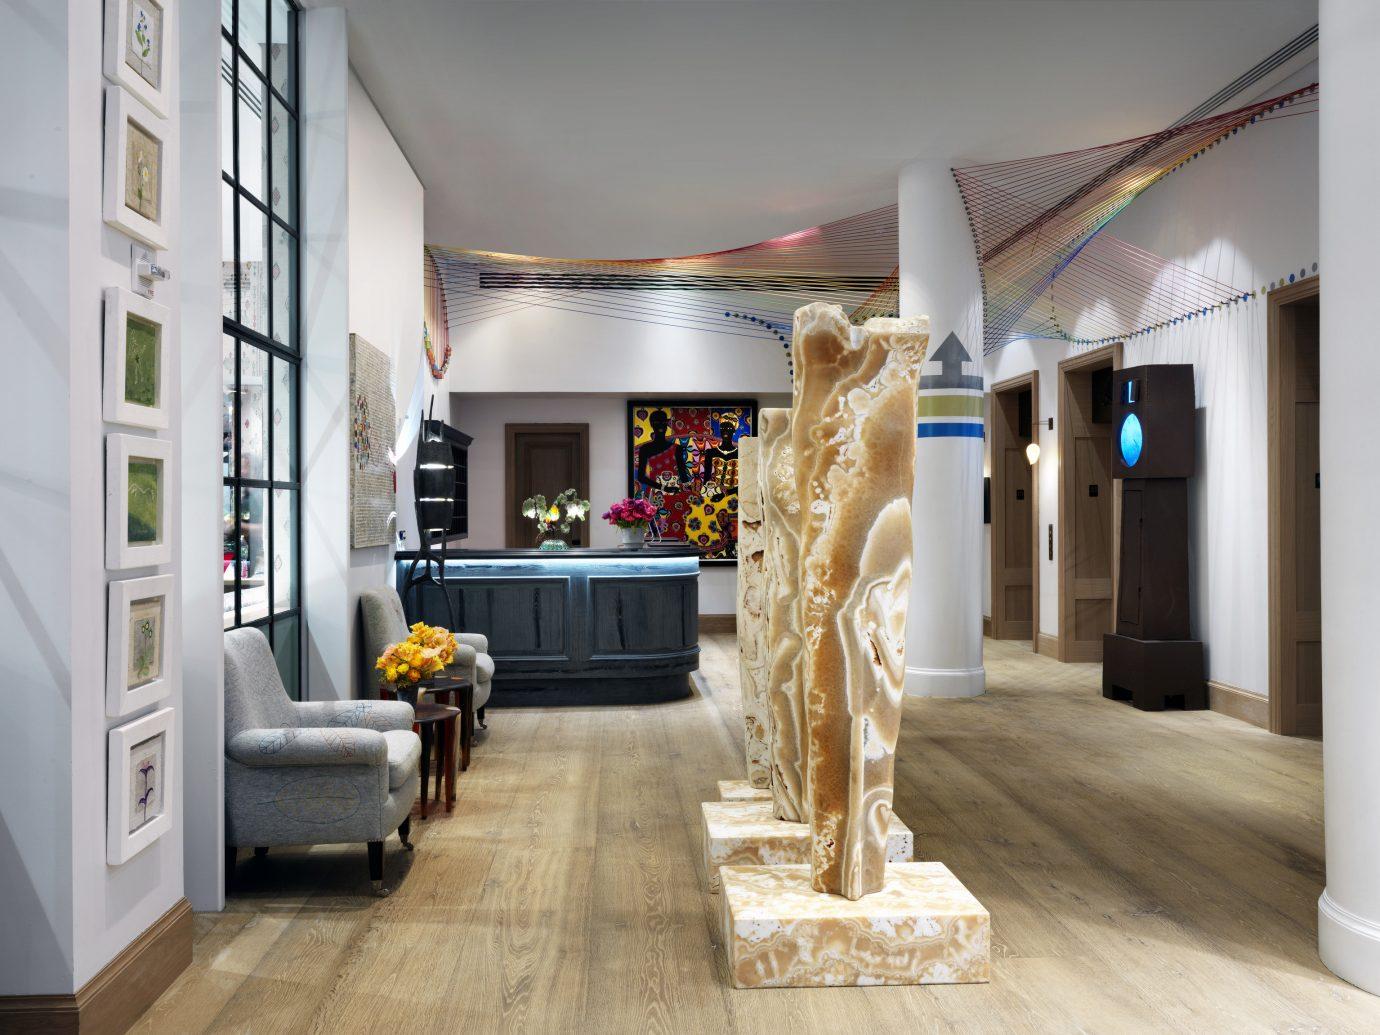 Hotels NYC indoor floor room property Living Boutique home living room interior design estate Lobby hall retail Design flooring furniture